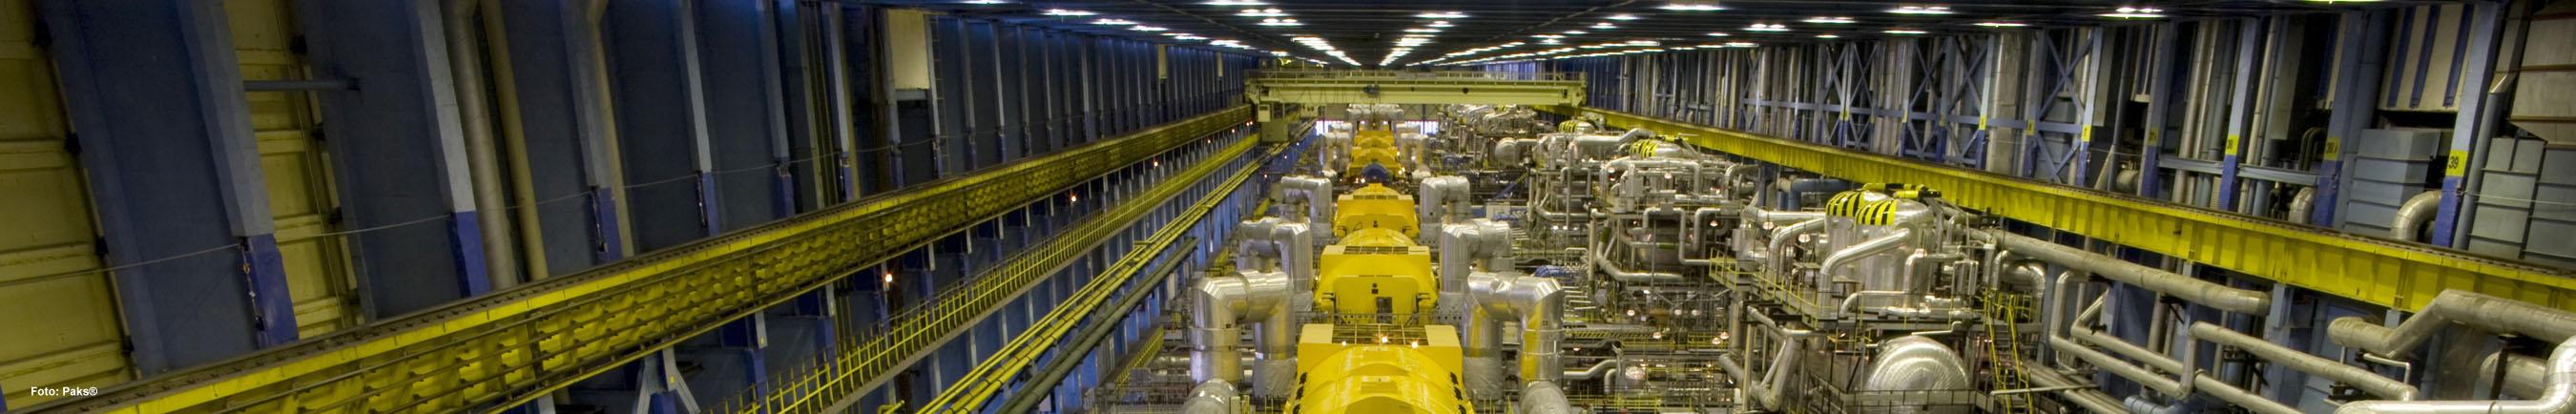 AZ-START-Kernkraftwerk-paks